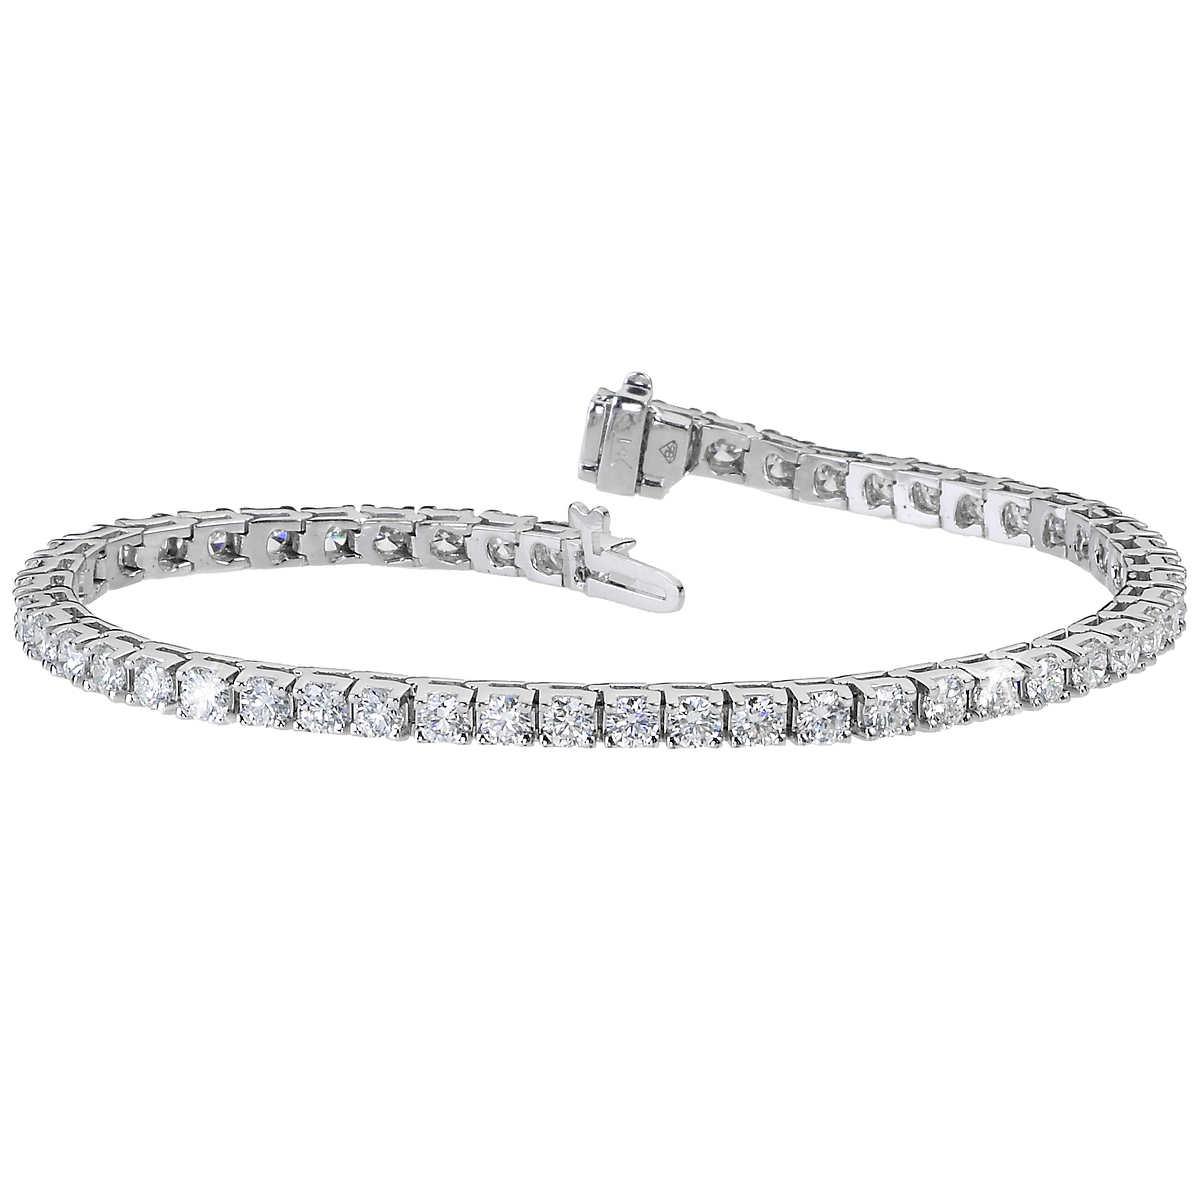 396138f4d ... Round Brilliant 5.00 ctw VS2 Clarity, I Color Diamond 14kt White Gold  Bracelet. 1 1